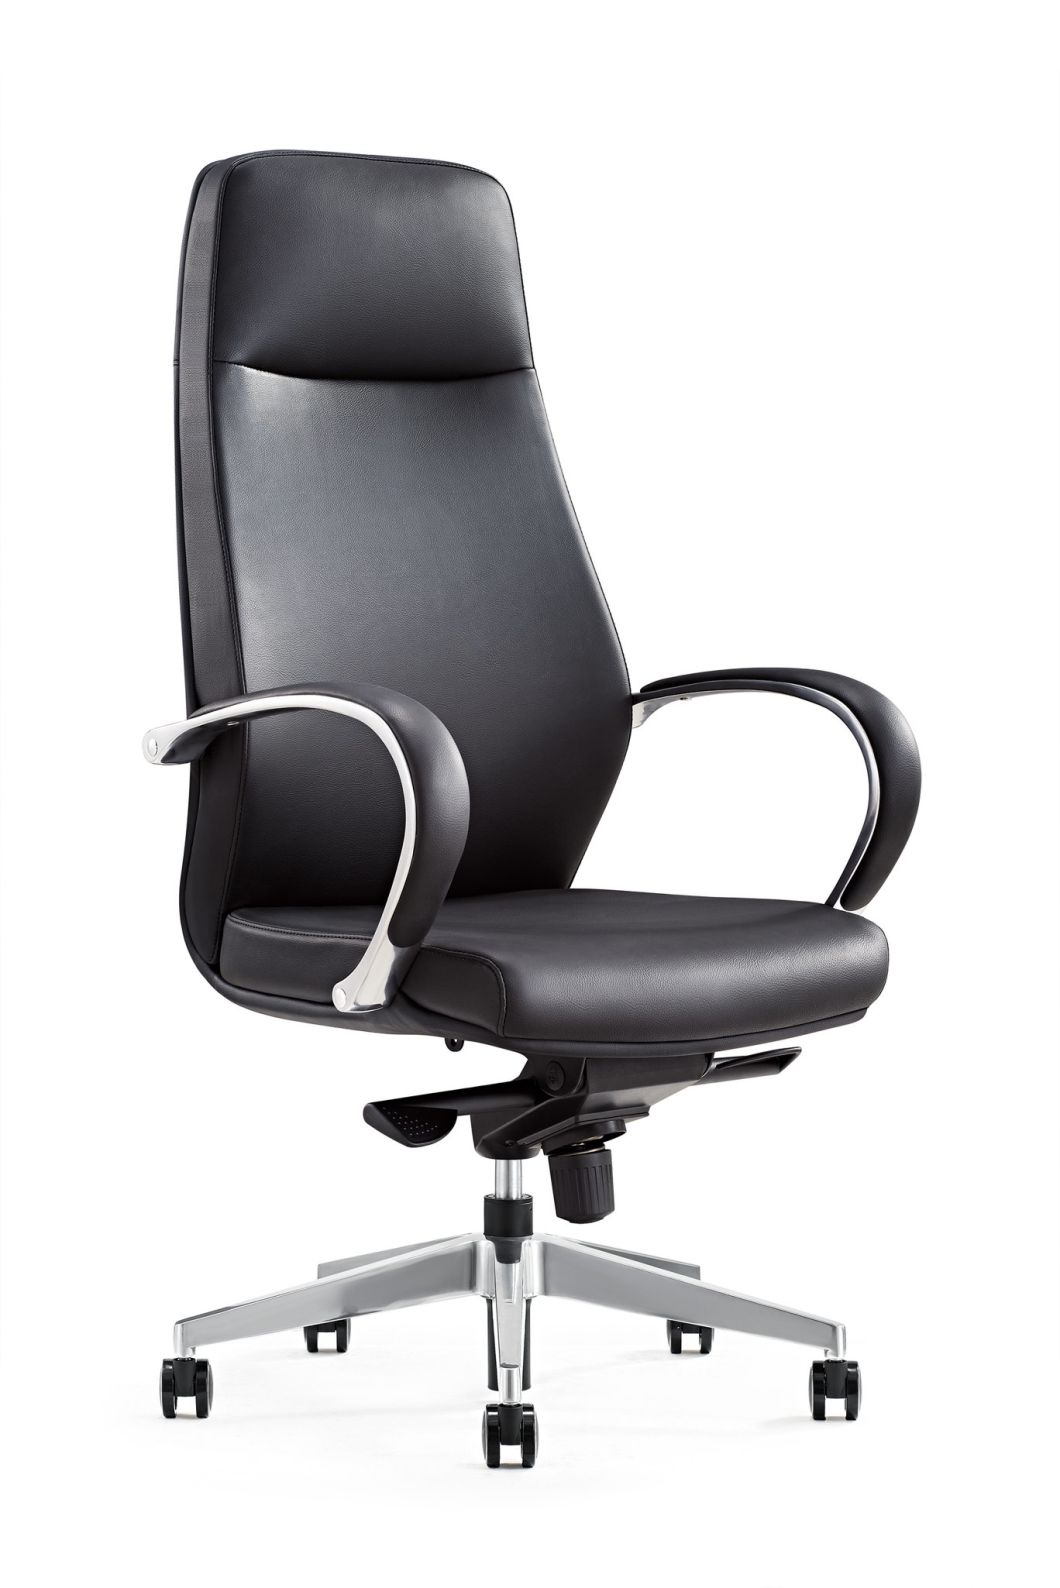 Modern Black High Back Executive Swivel Leisure Boss PU Chair